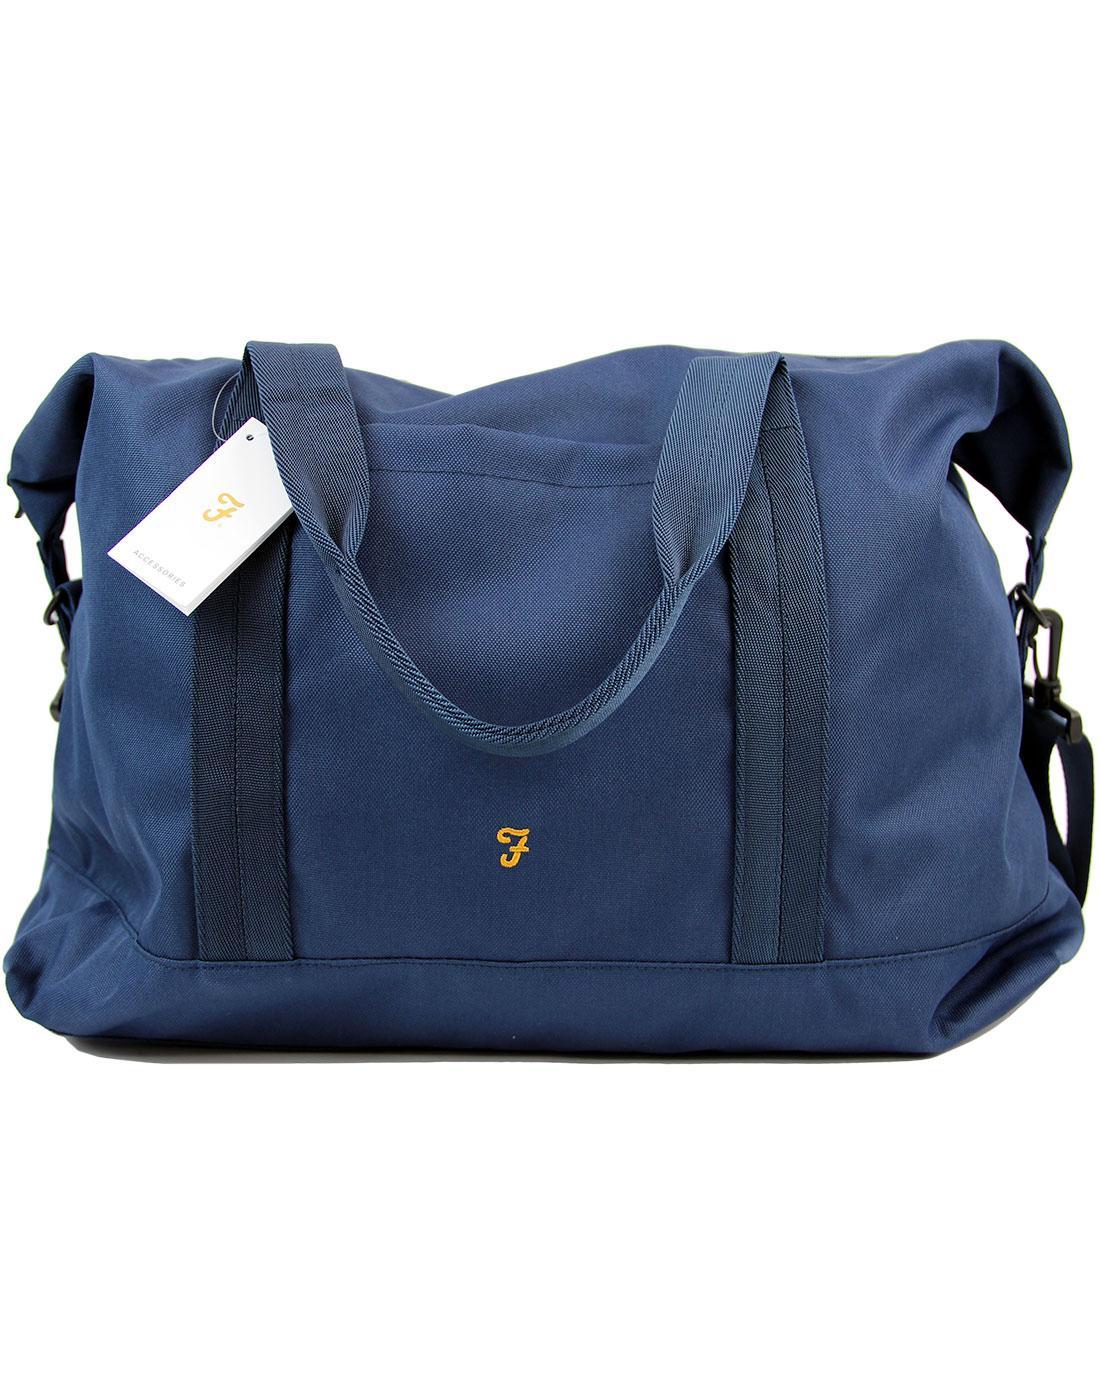 Franks FARAH Retro Military Weekend Bag BLUE